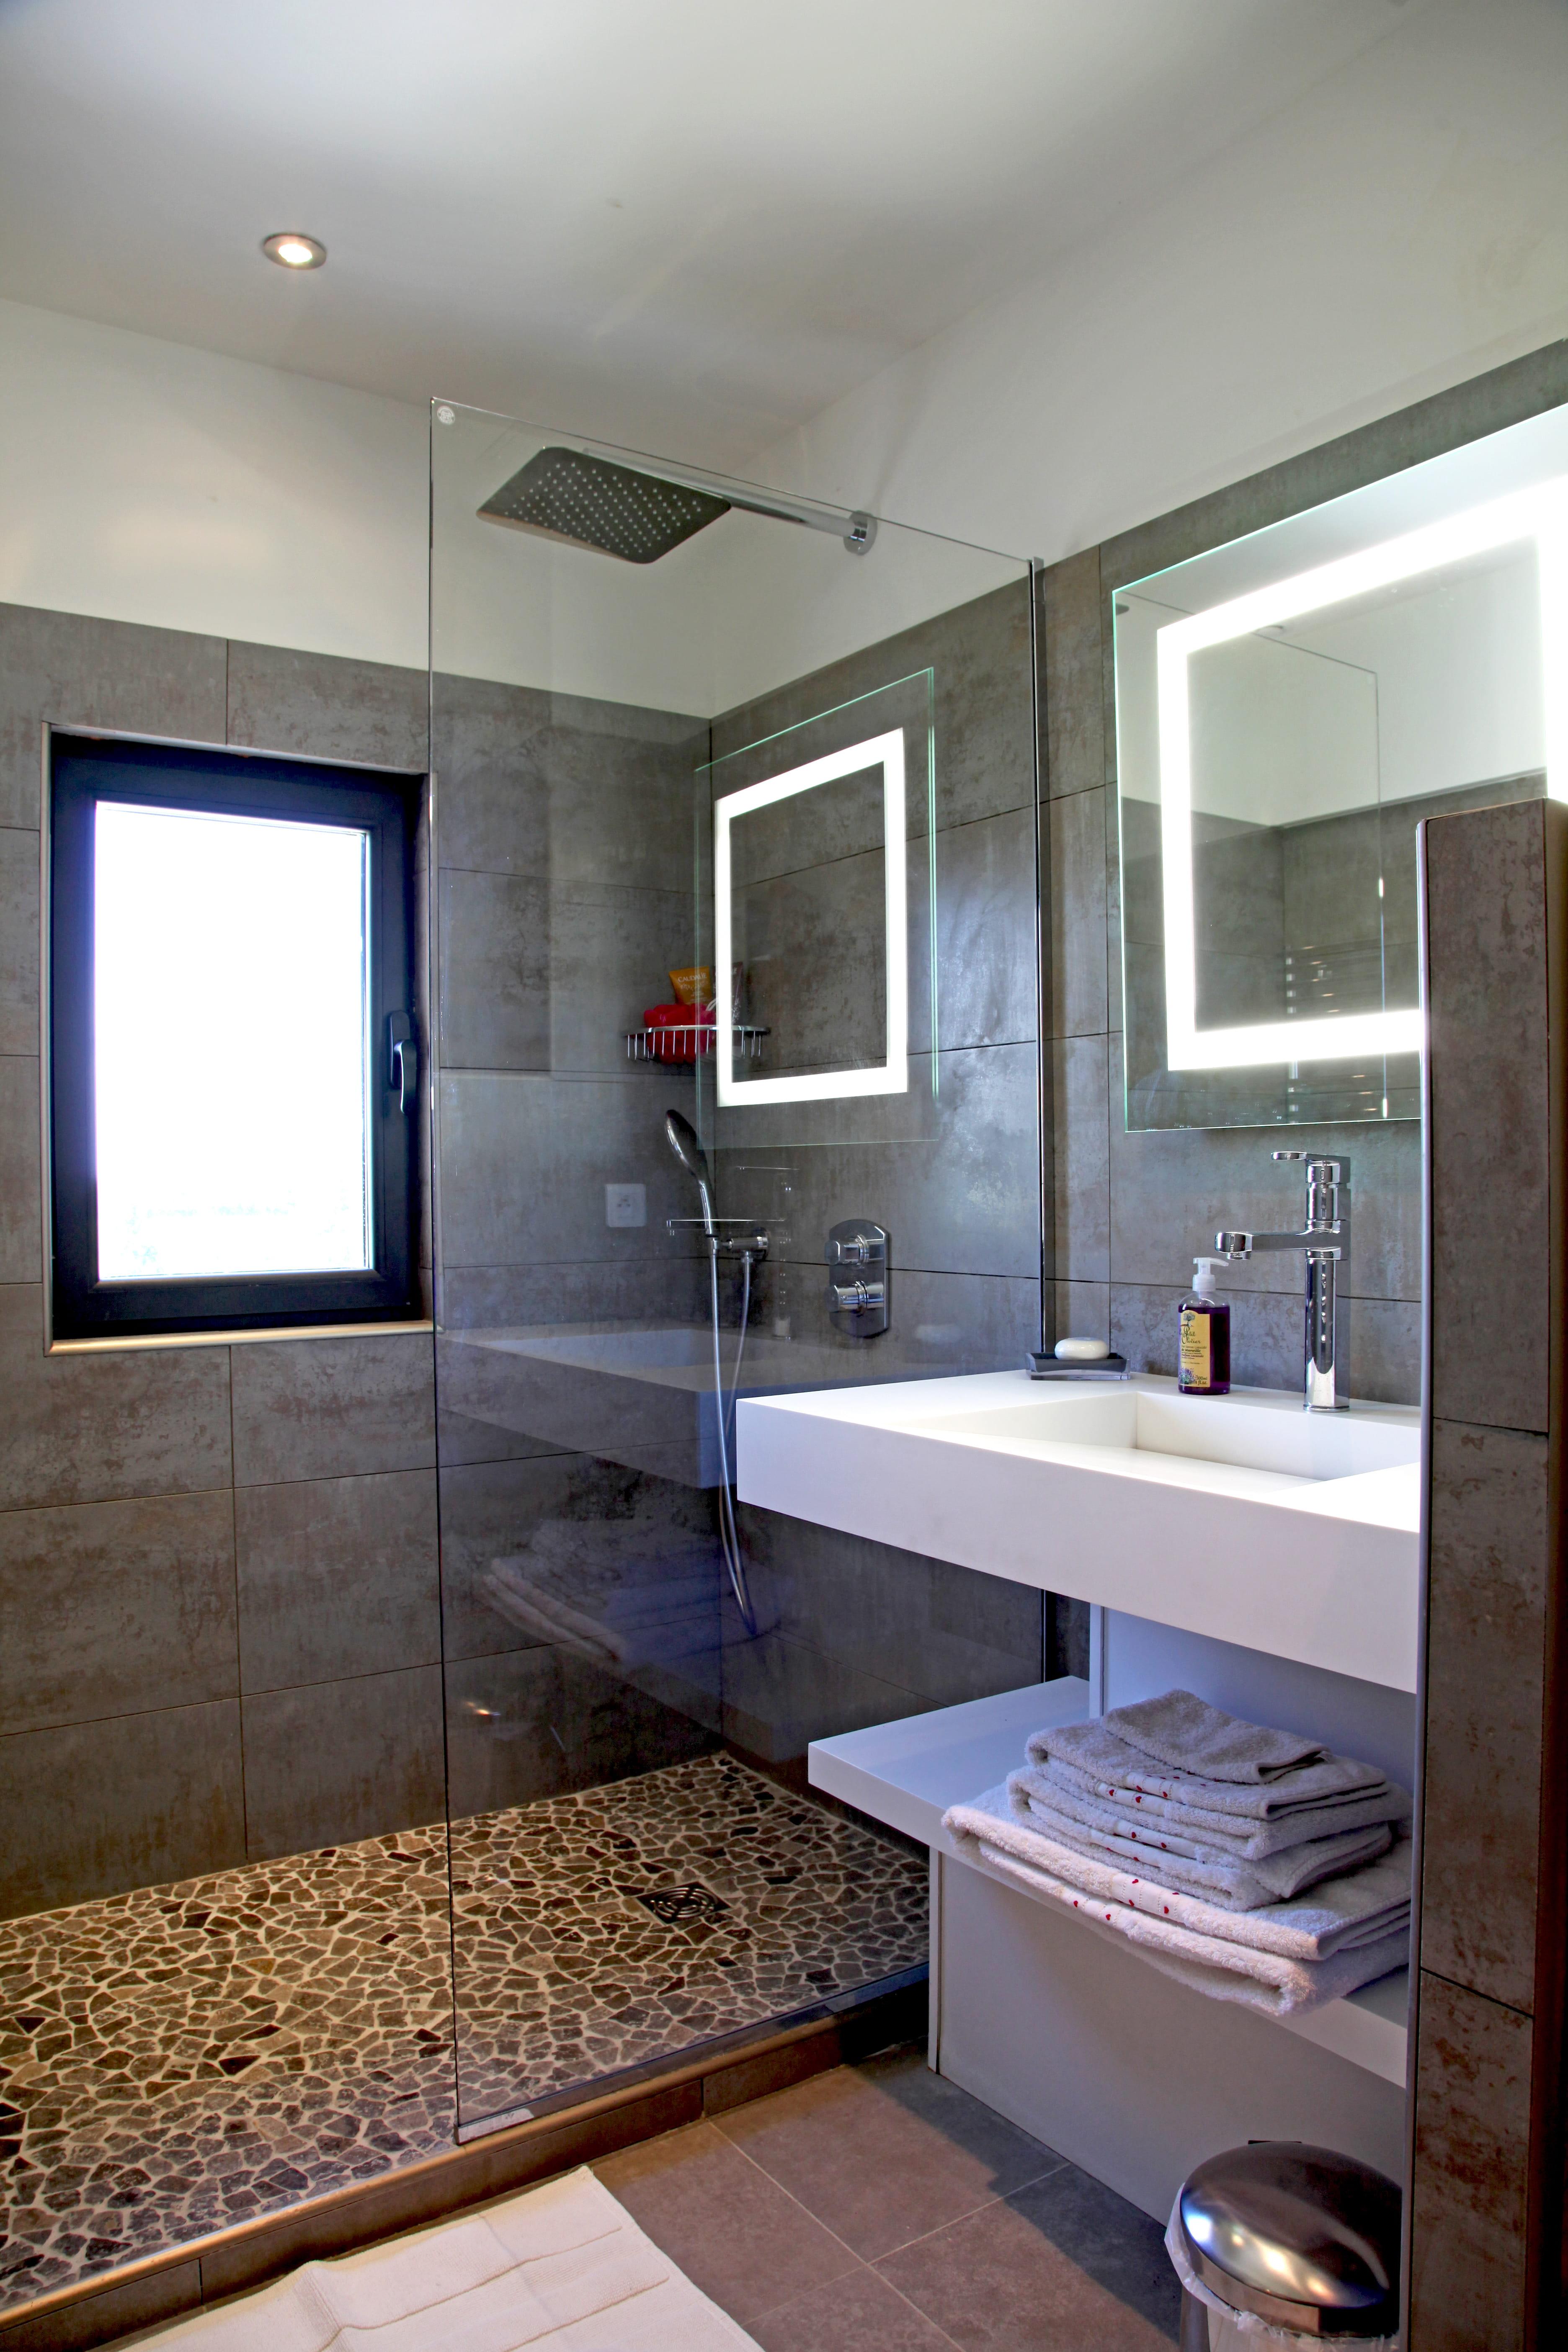 salle de bains ultra moderne salle de bains petite petite salle bain moderne - Salle De Bain Petite Et Moderne